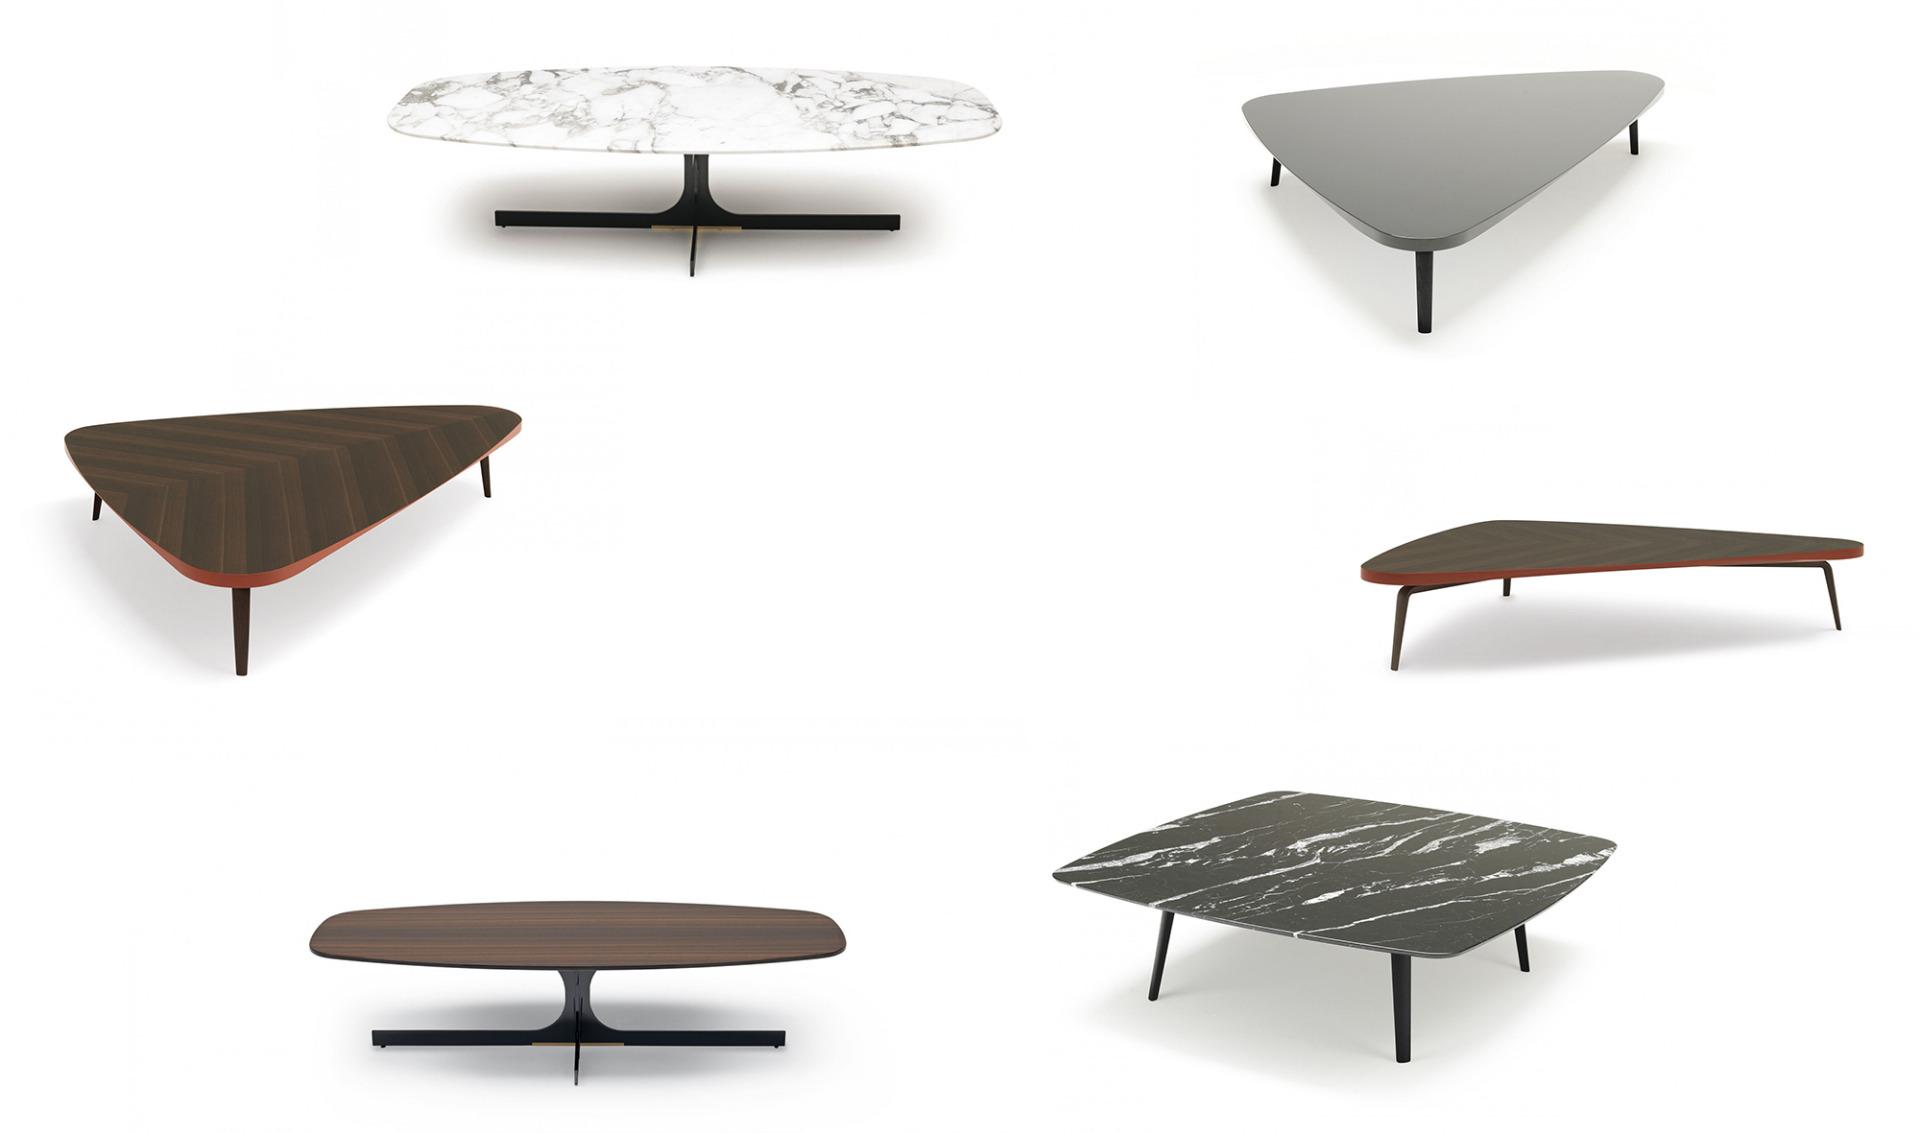 MisuraEmme Gramercy Low Table WoodFrame, MisuraEmme Janus LowTable Marble Plane